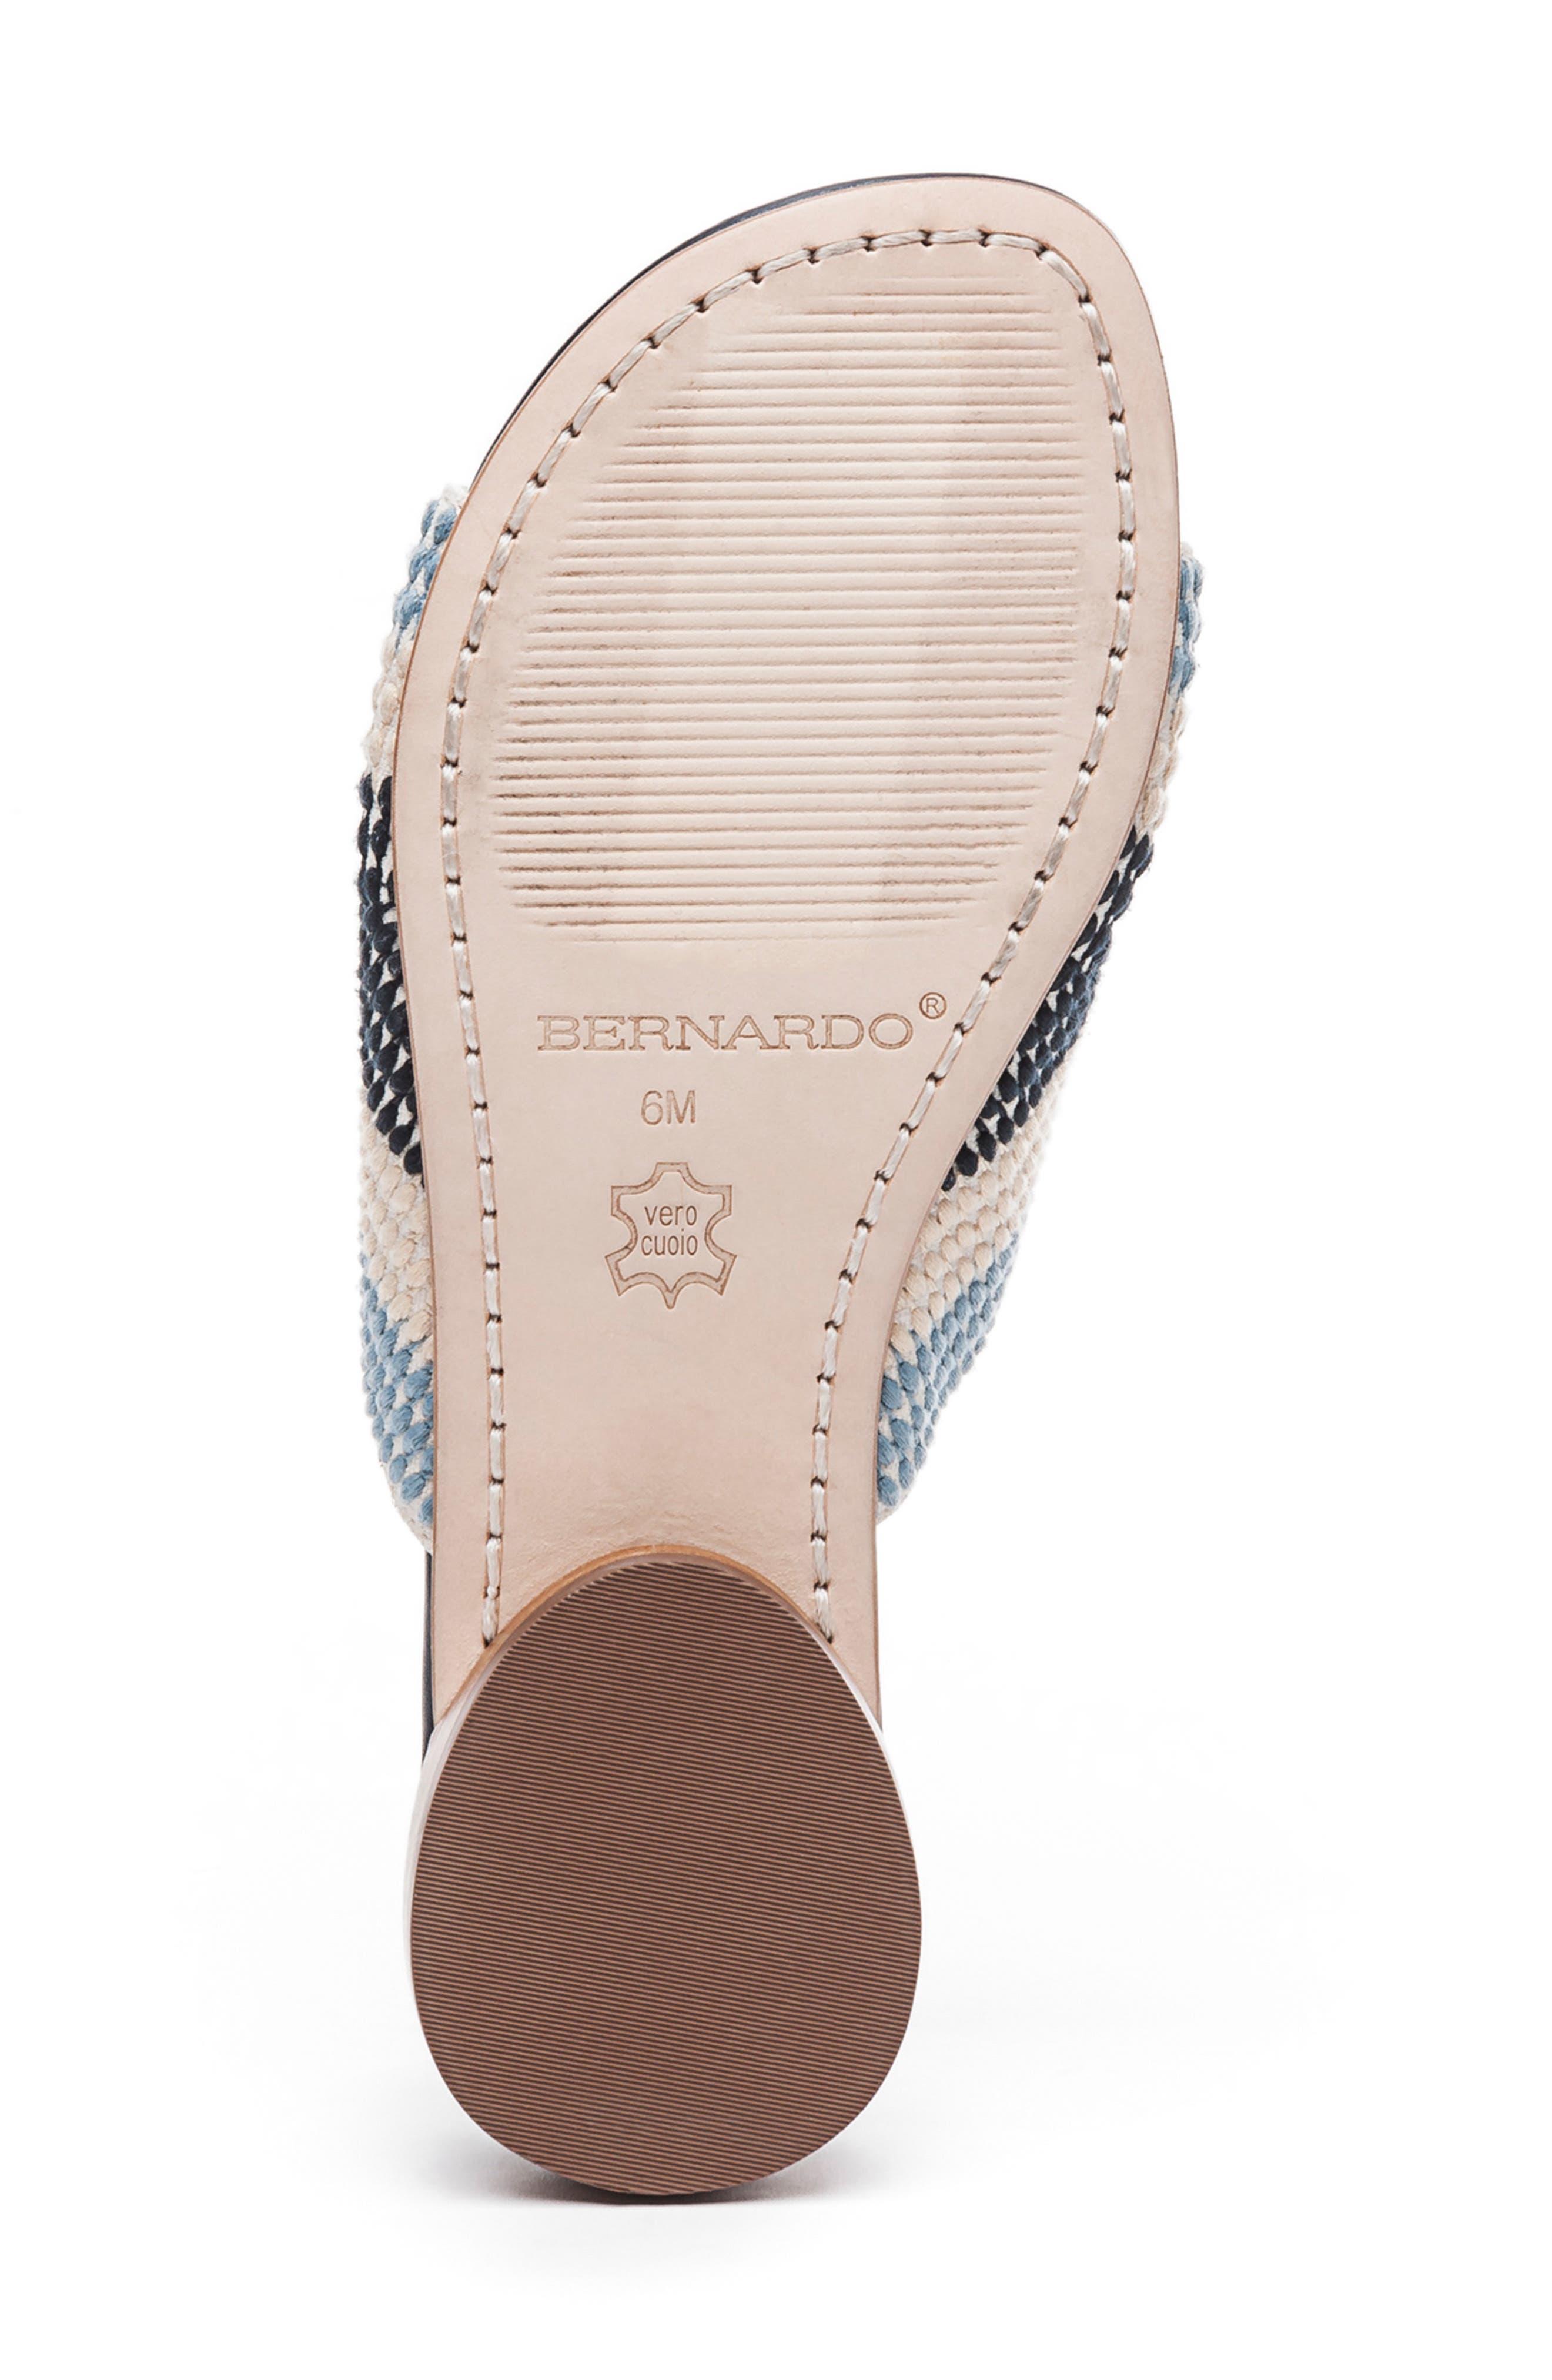 BERNARDO, Footwear Tay Slide Sandal, Alternate thumbnail 6, color, BLUE/ CREAM LEATHER